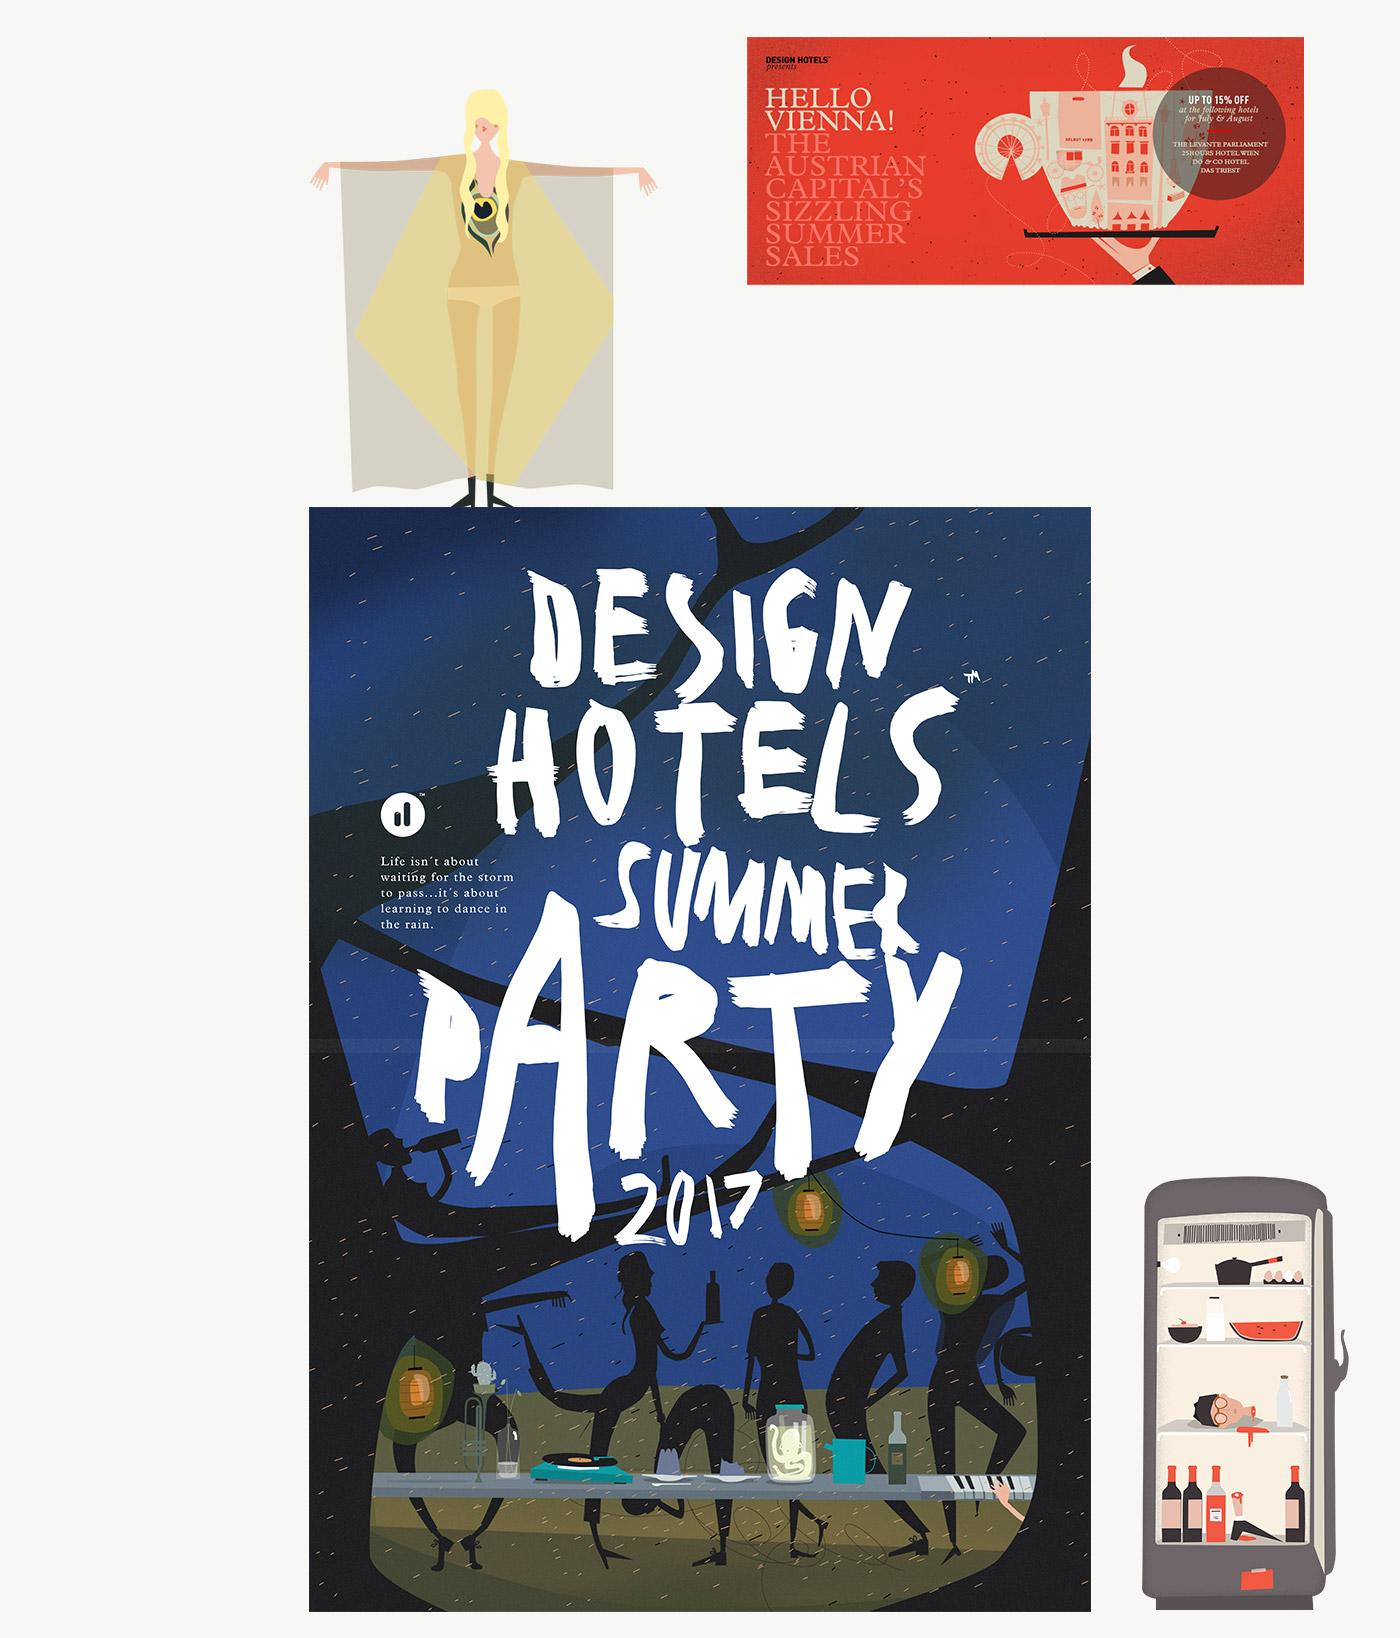 designhotels-community-illus-part7